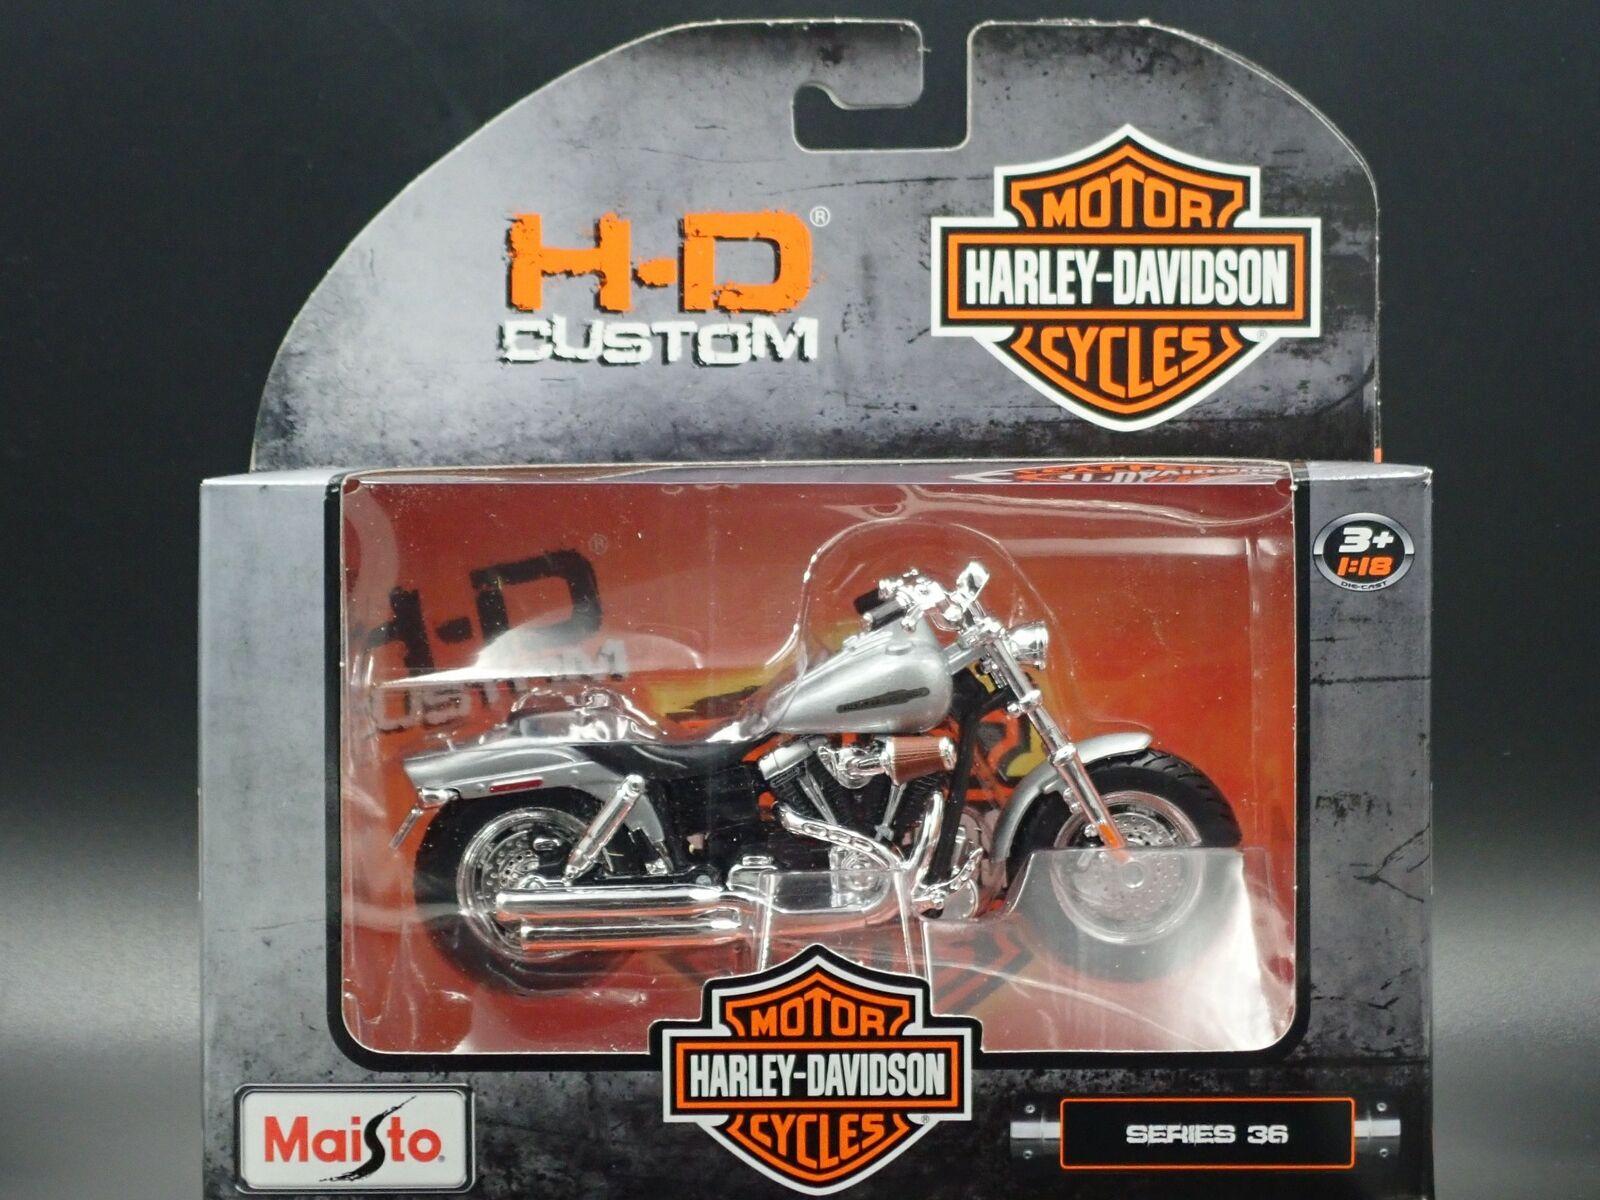 HARLEY DAVIDSON 2009 FXDFSE CVO FAT BOB SILVER 1:18 Modellino Die Cast Moto Maisto